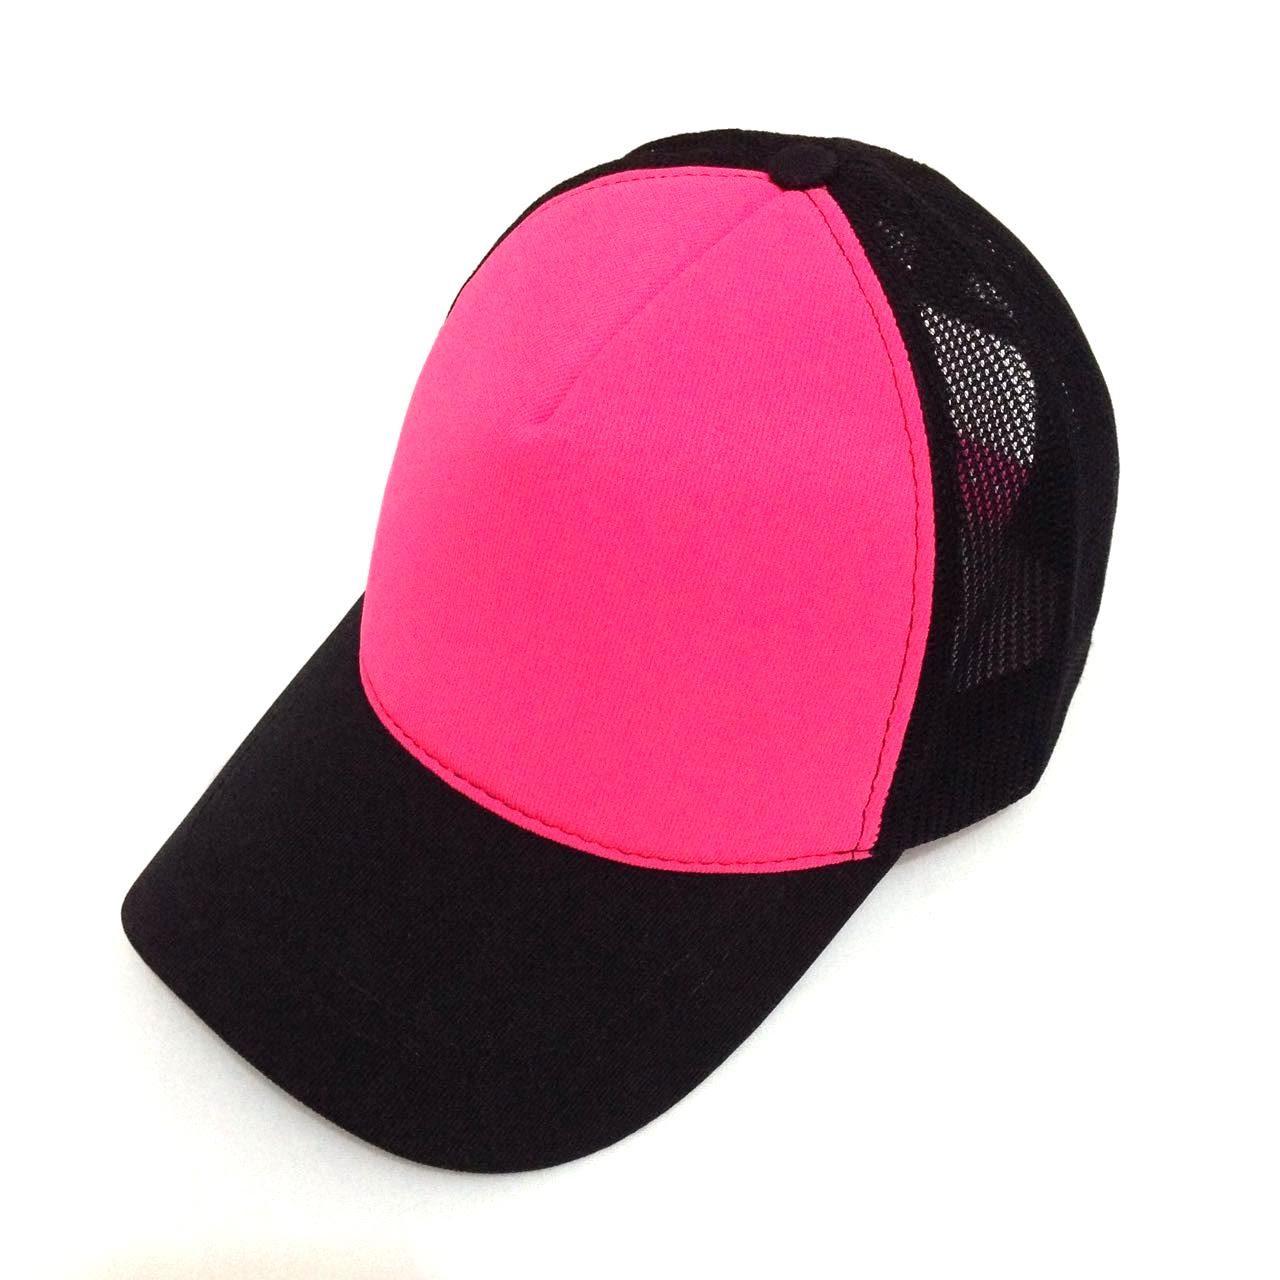 45f31f733b Boné trucker liso rosa e preto com aba em curva